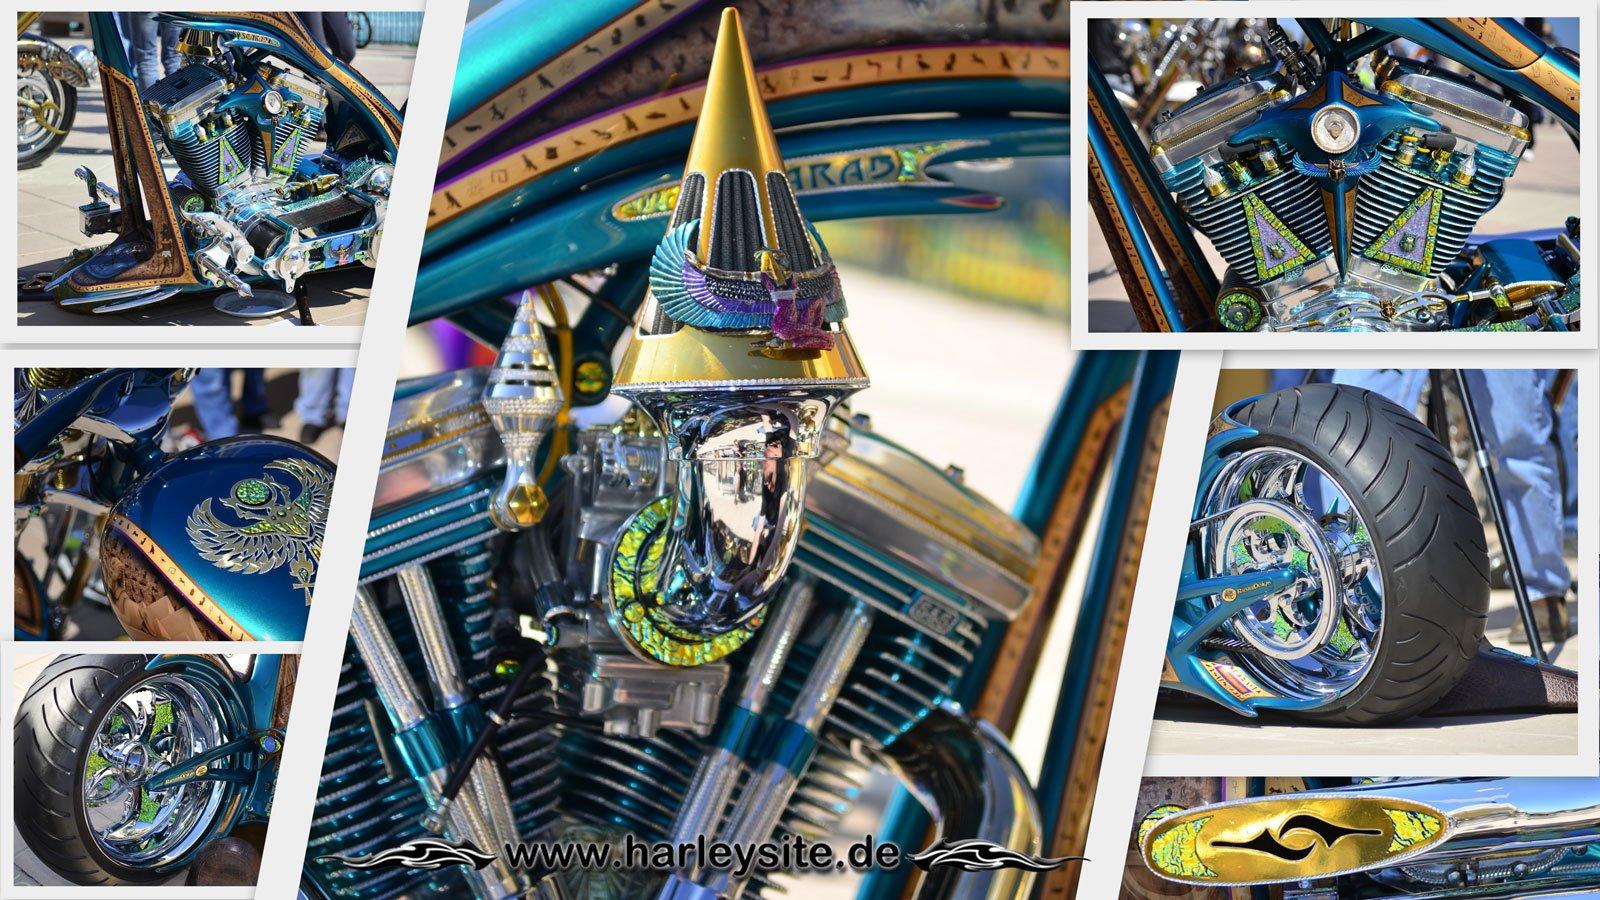 The Best Of Show 2013 Daytona 1 1